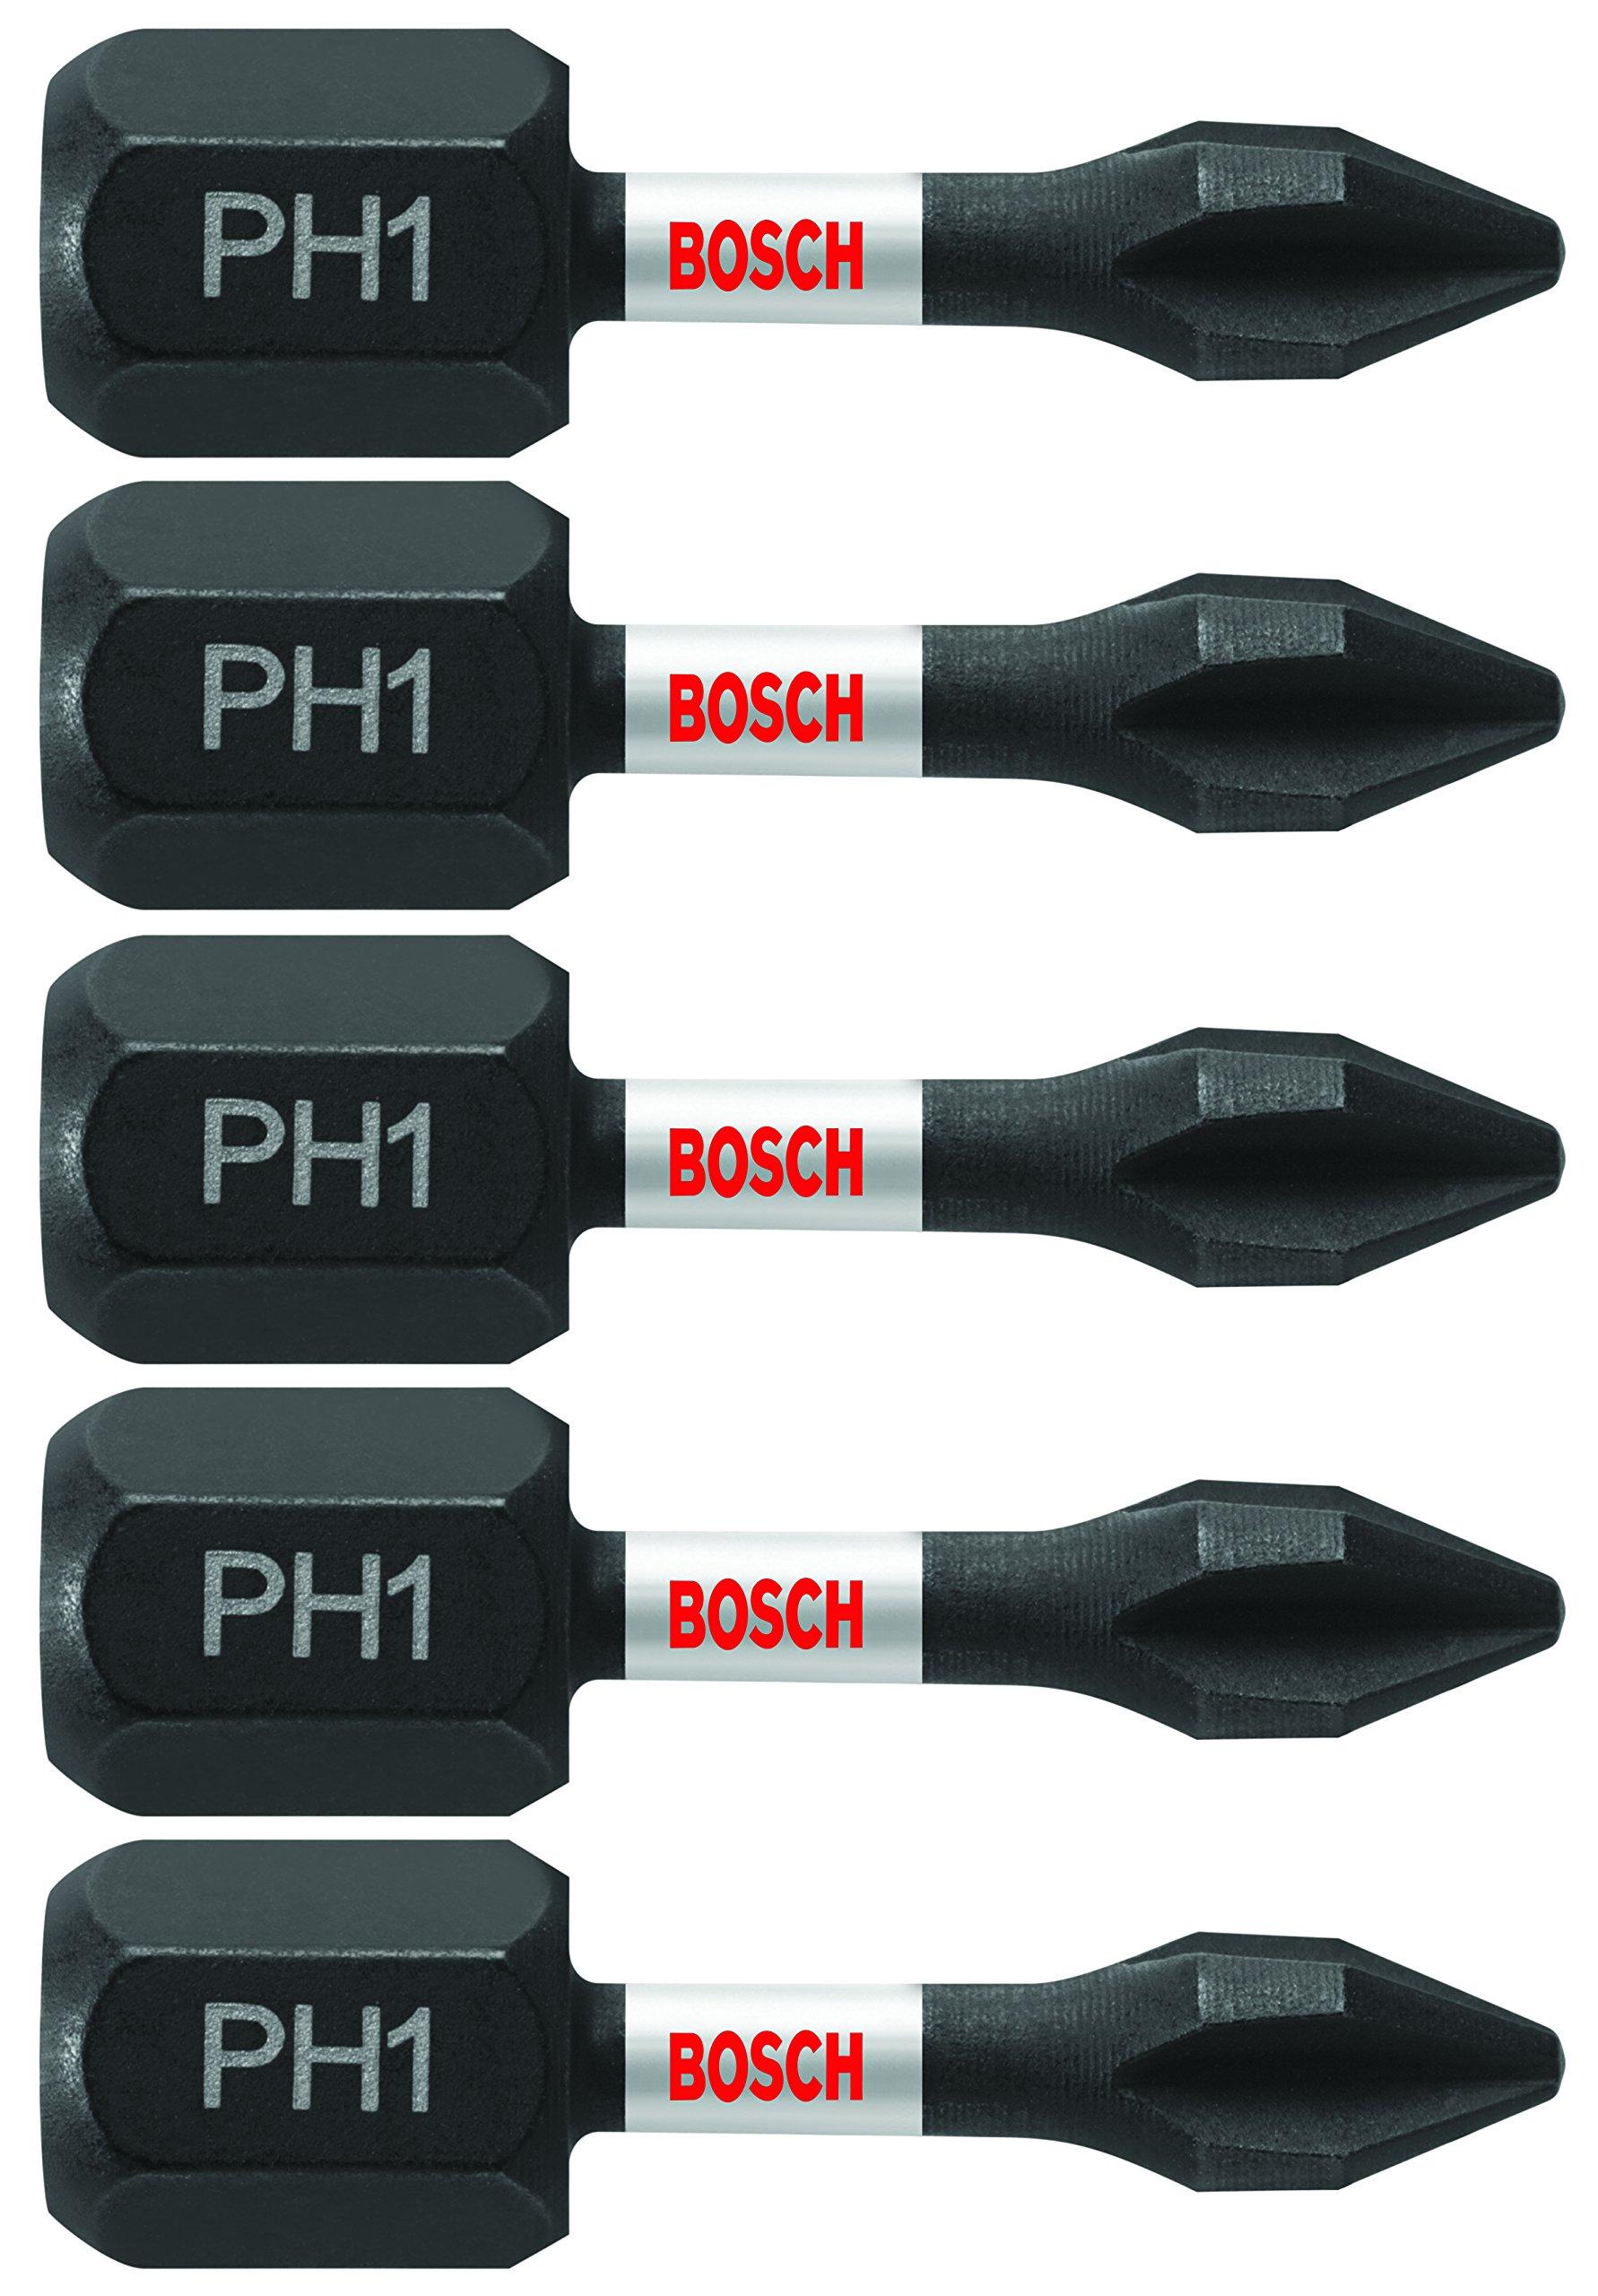 Bosch ITPH1105 5 Pc. Impact Tough 1 In. Phillips #1 Insert Bits